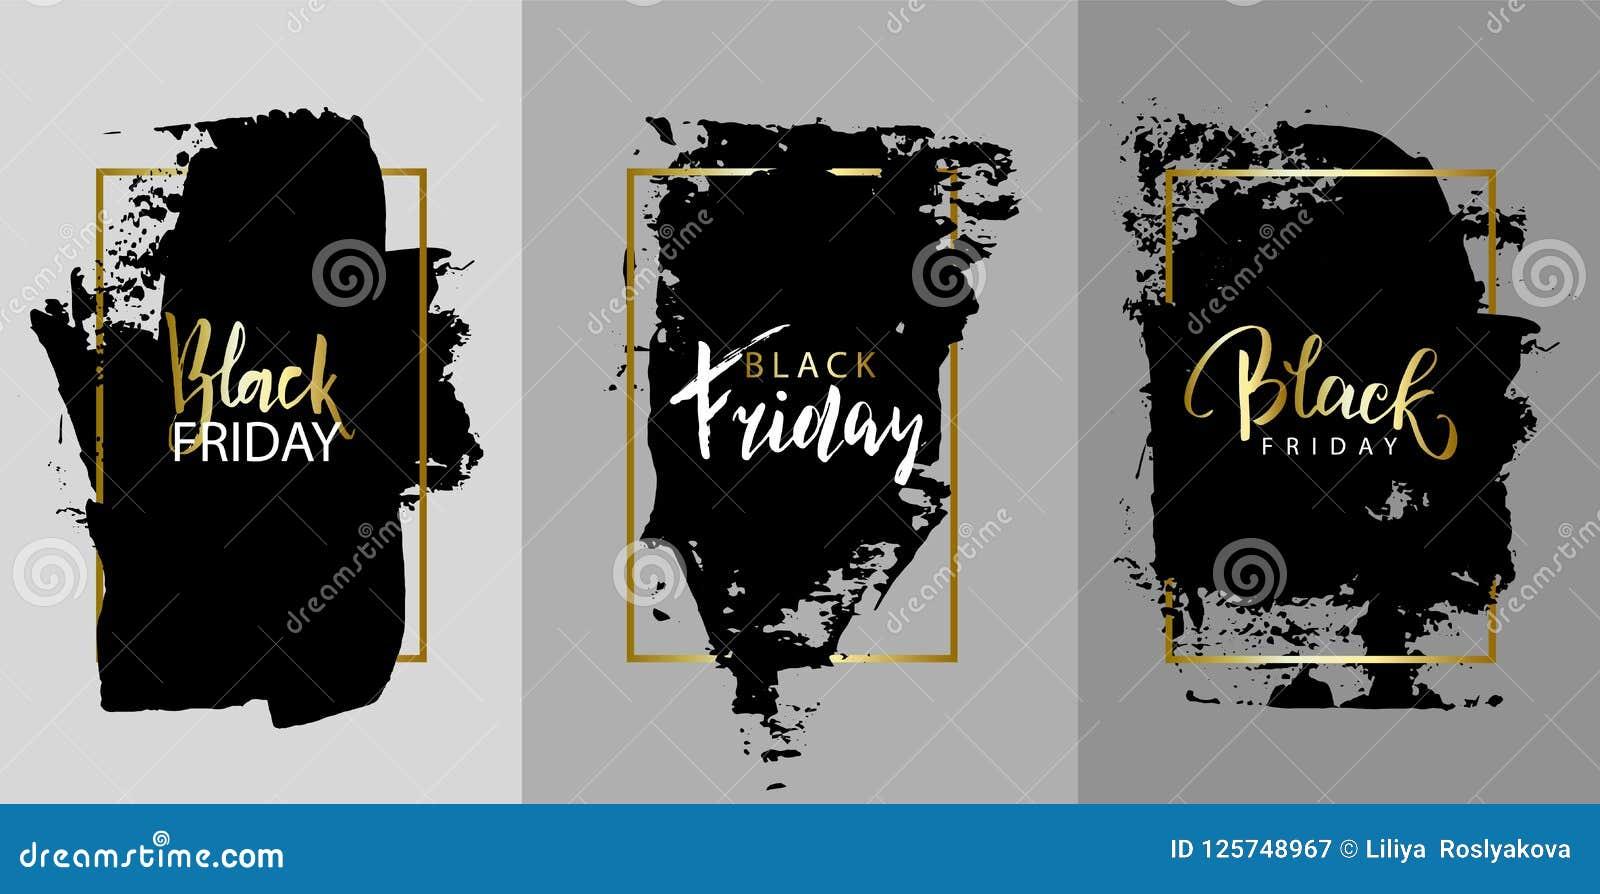 Black Friday.Vector black paint, ink brush stroke, brush, line or texture. Texture artistic design element, box, frame